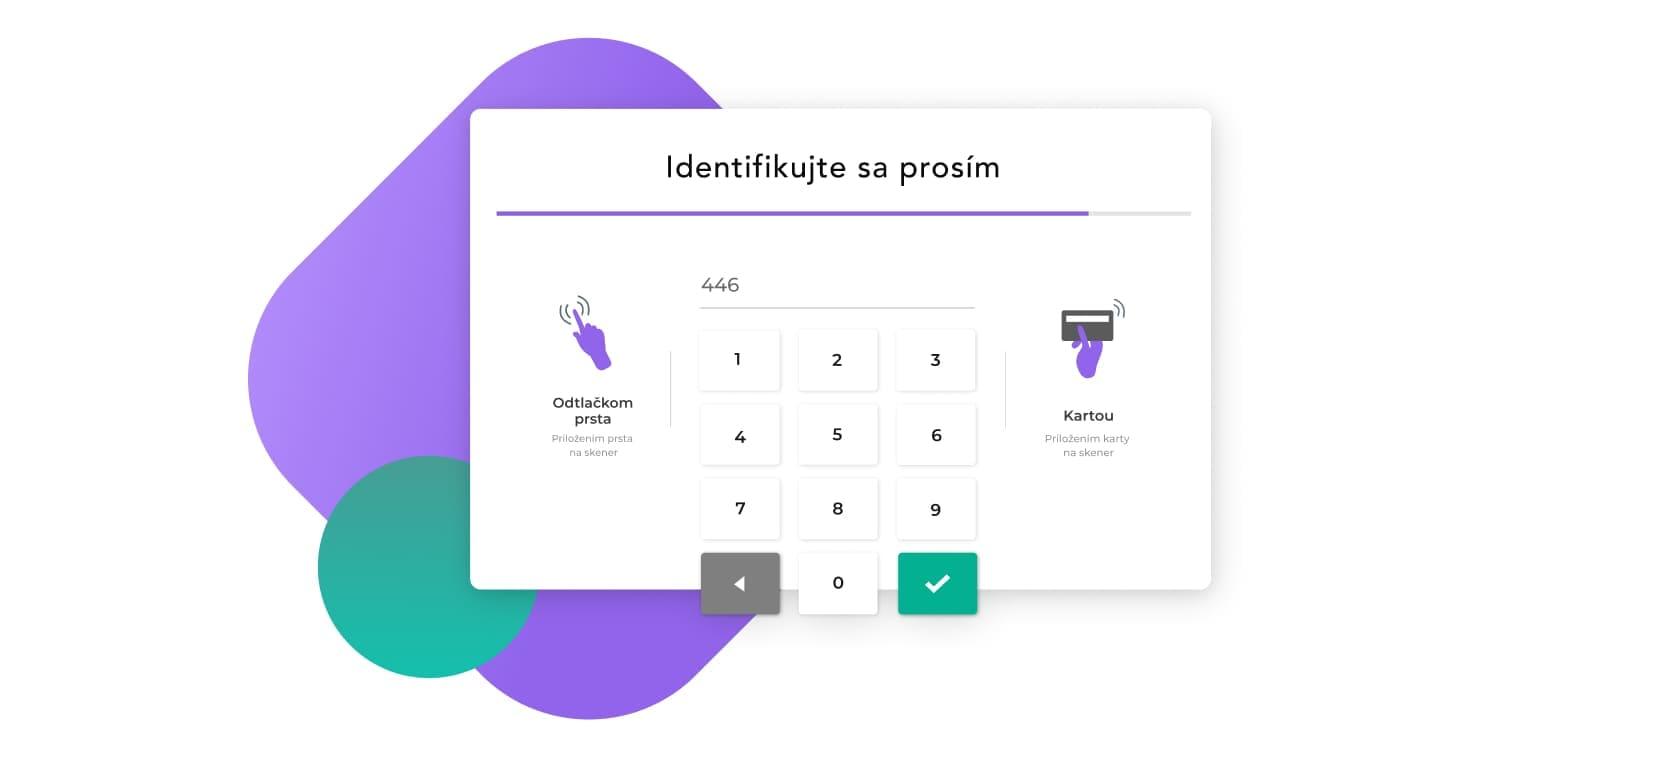 multiple login options like finger password or card